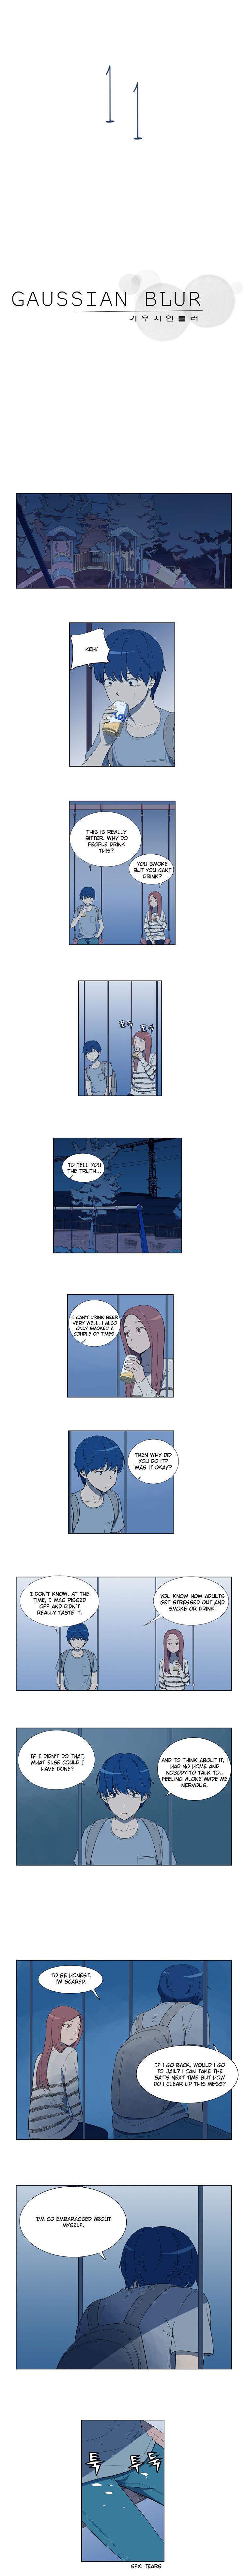 Gaussian Blur 11 Page 2